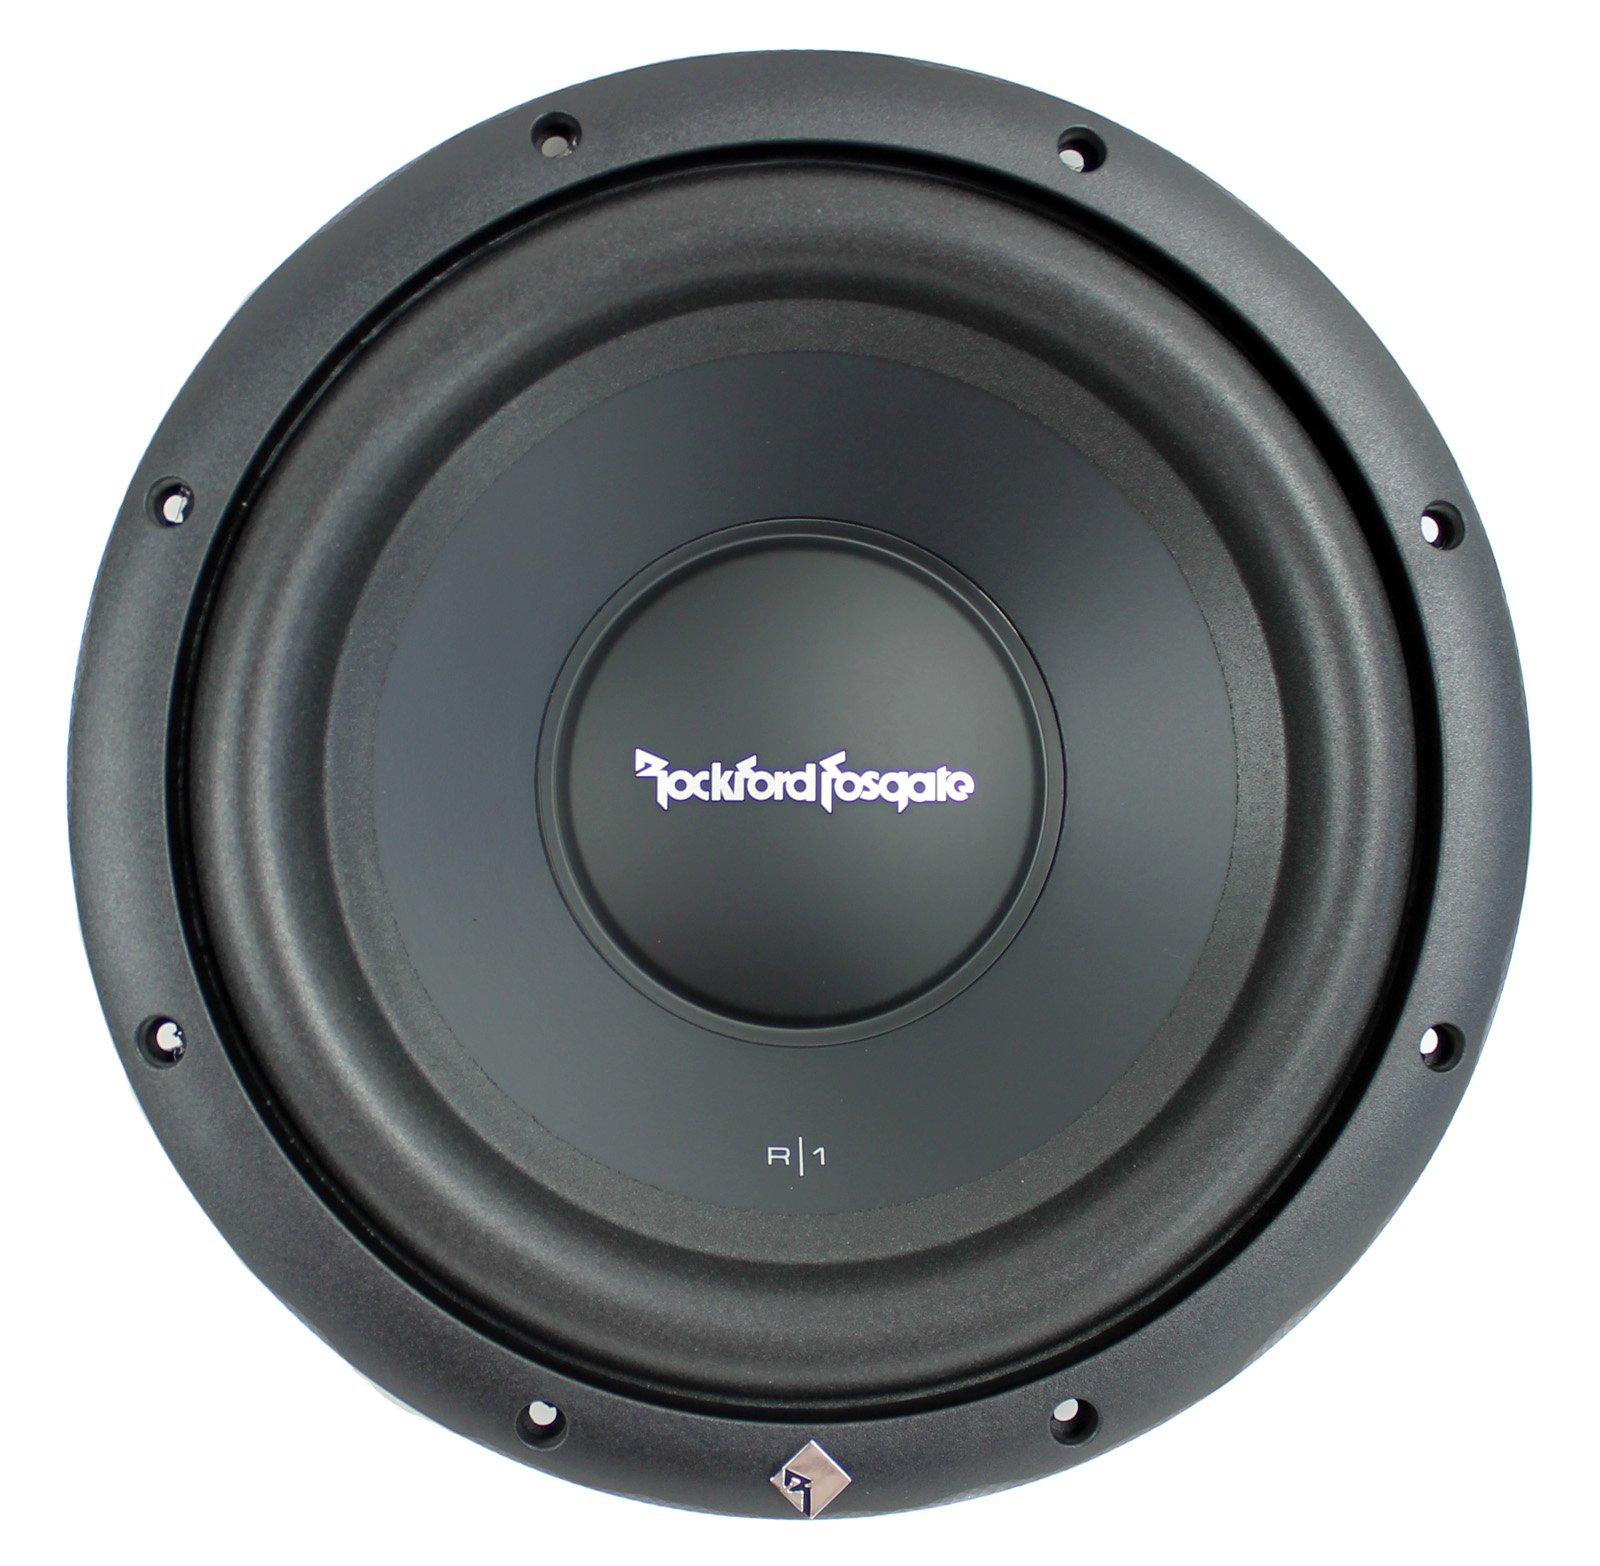 "Rockford Fosgate R1S4-10 Prime 10"" 300 Watt 4 Ohm SVC Car Audio Subwoofer Sub"